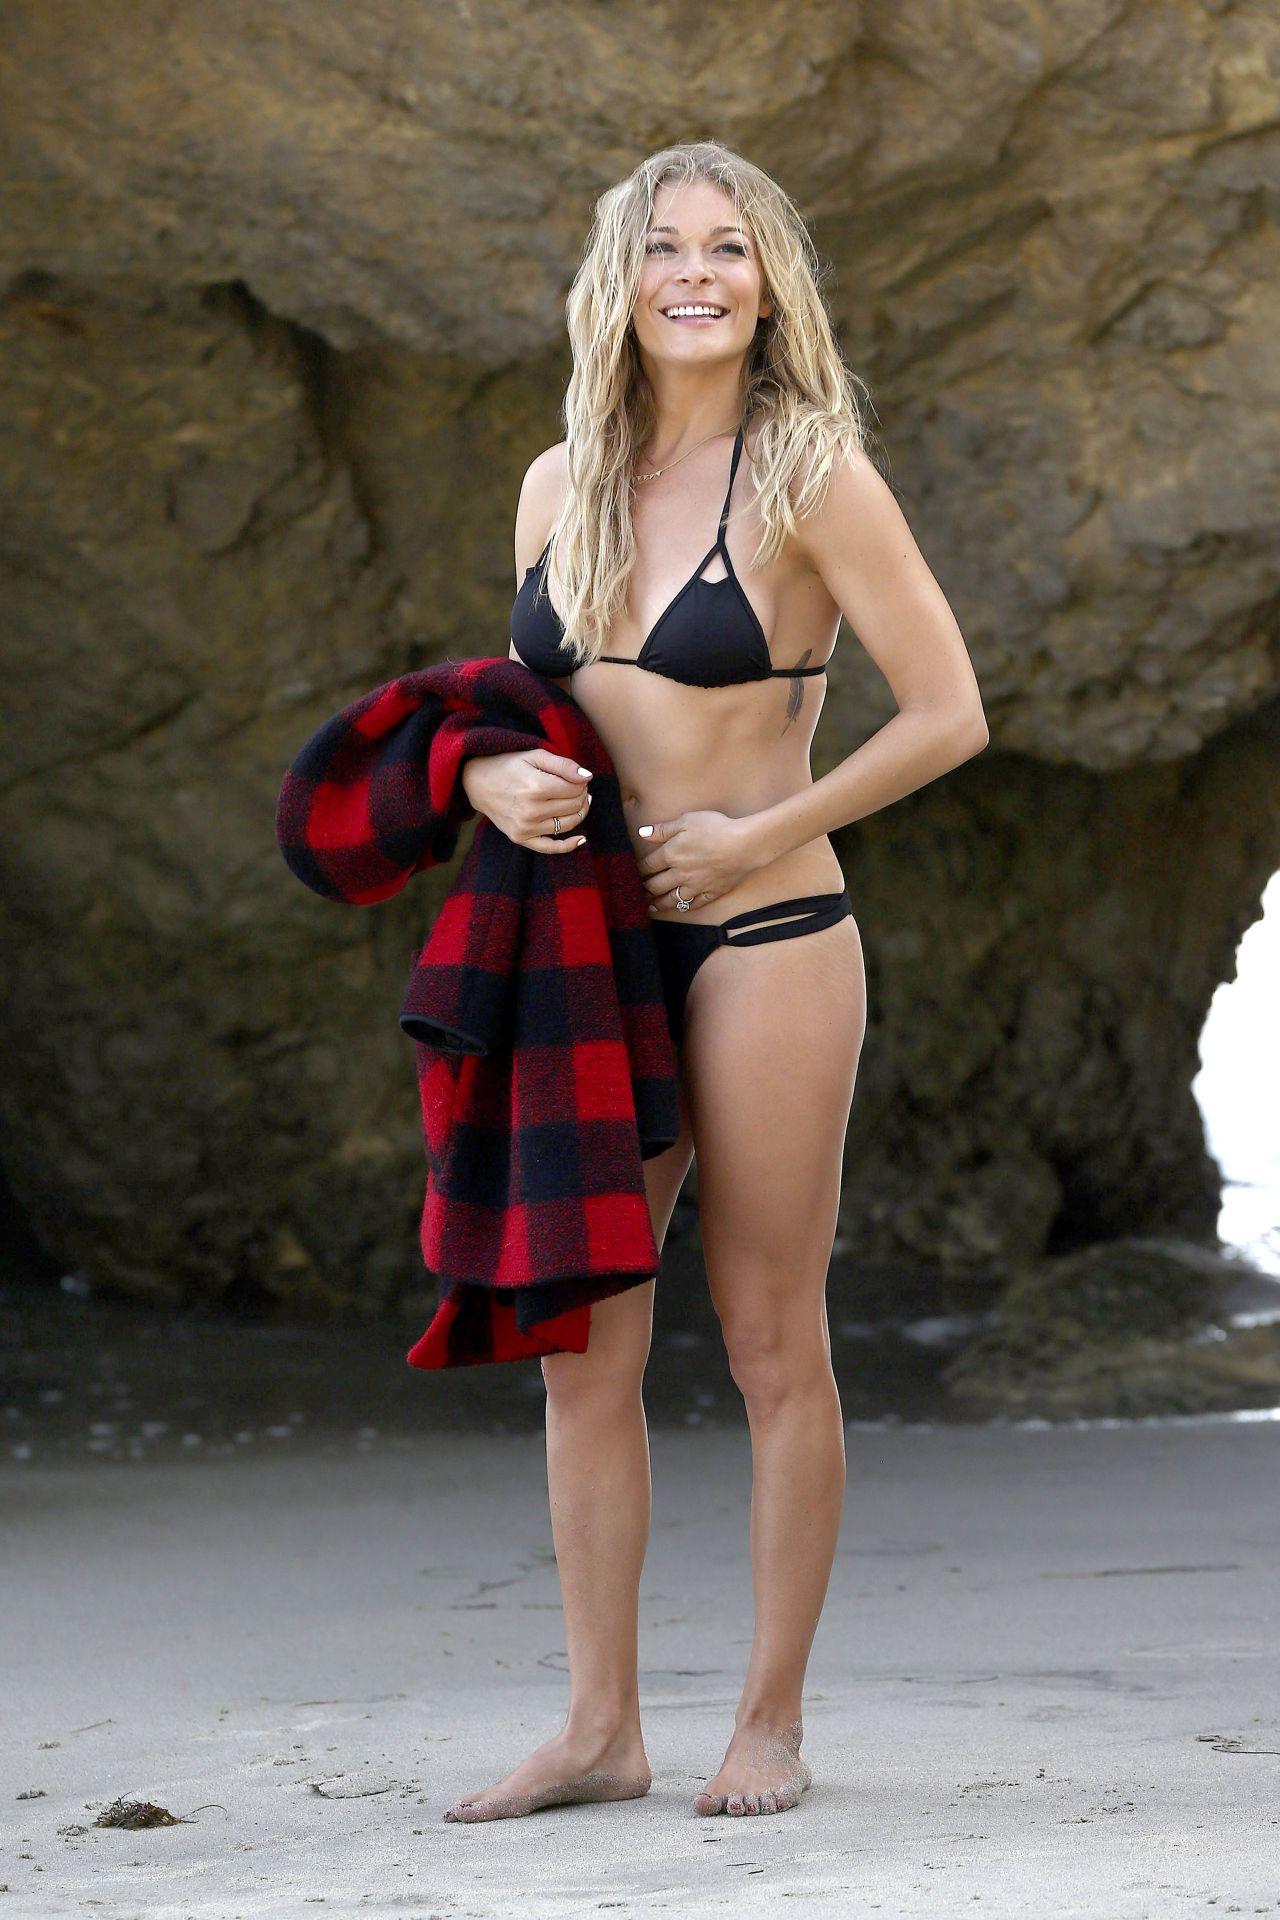 Leann Rimes Bikini Photoshoot In Malibu